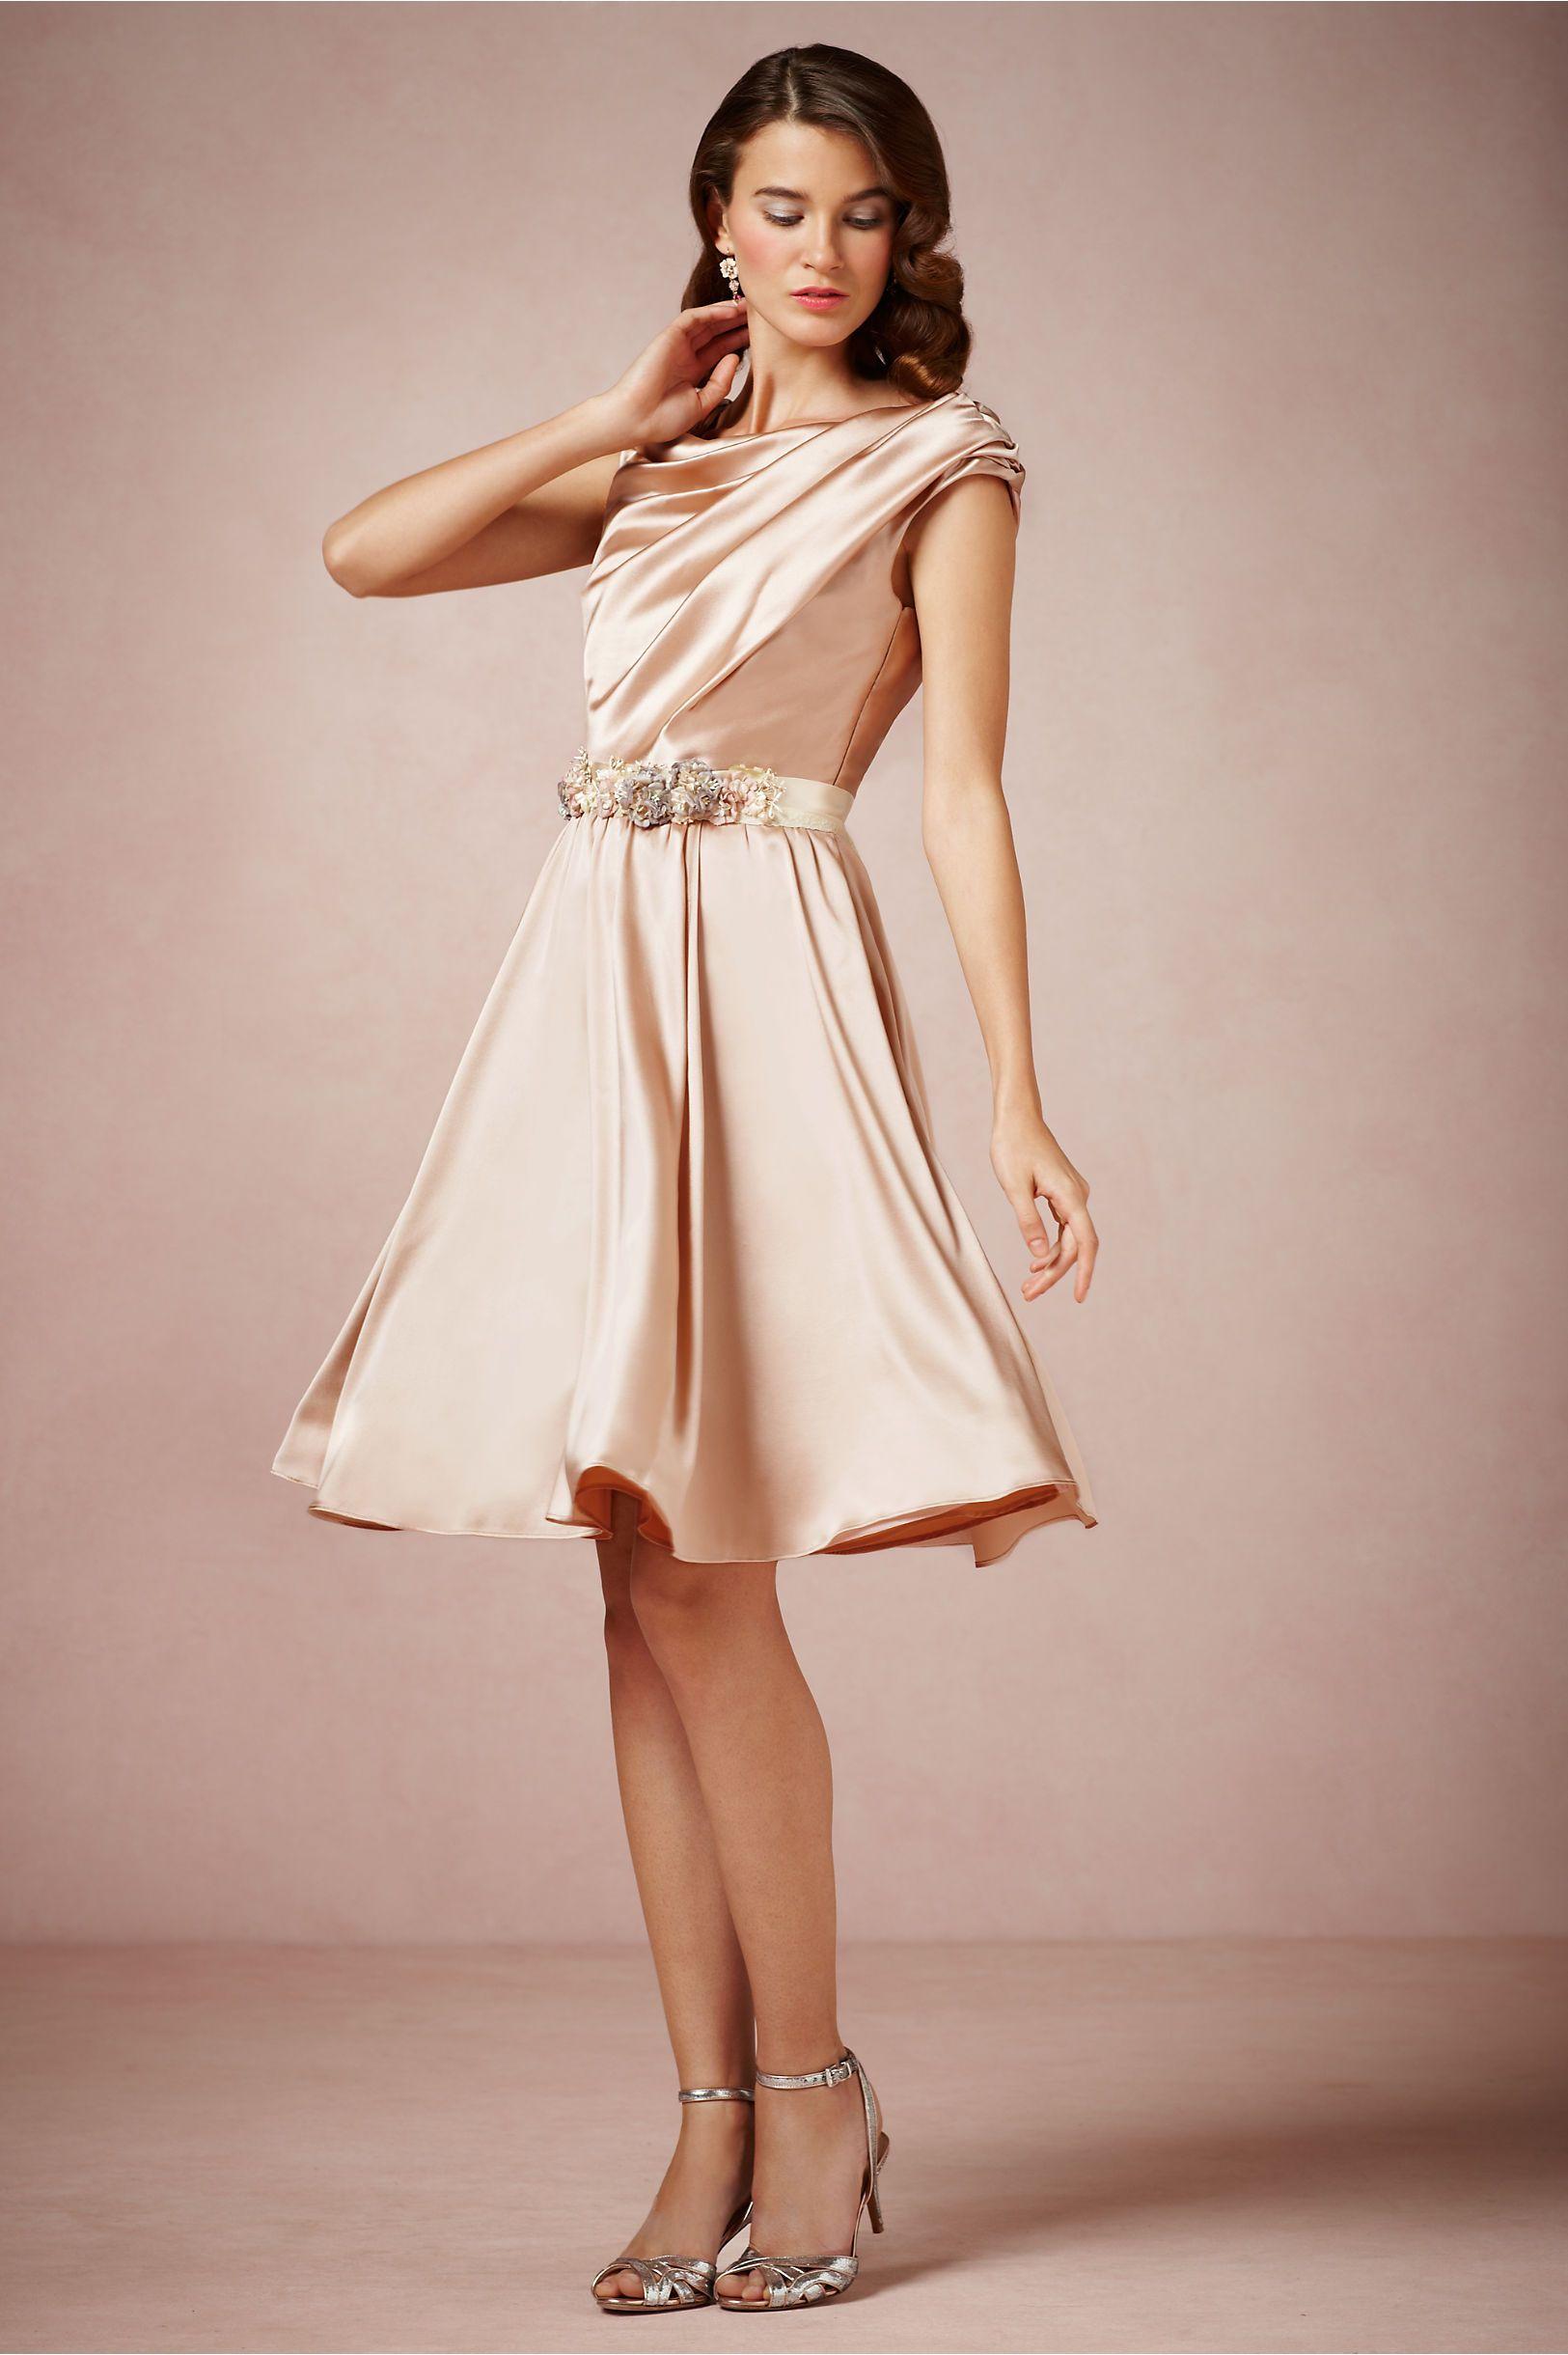 Preservation Society Dress from BHLDN   Mein Stil   Pinterest